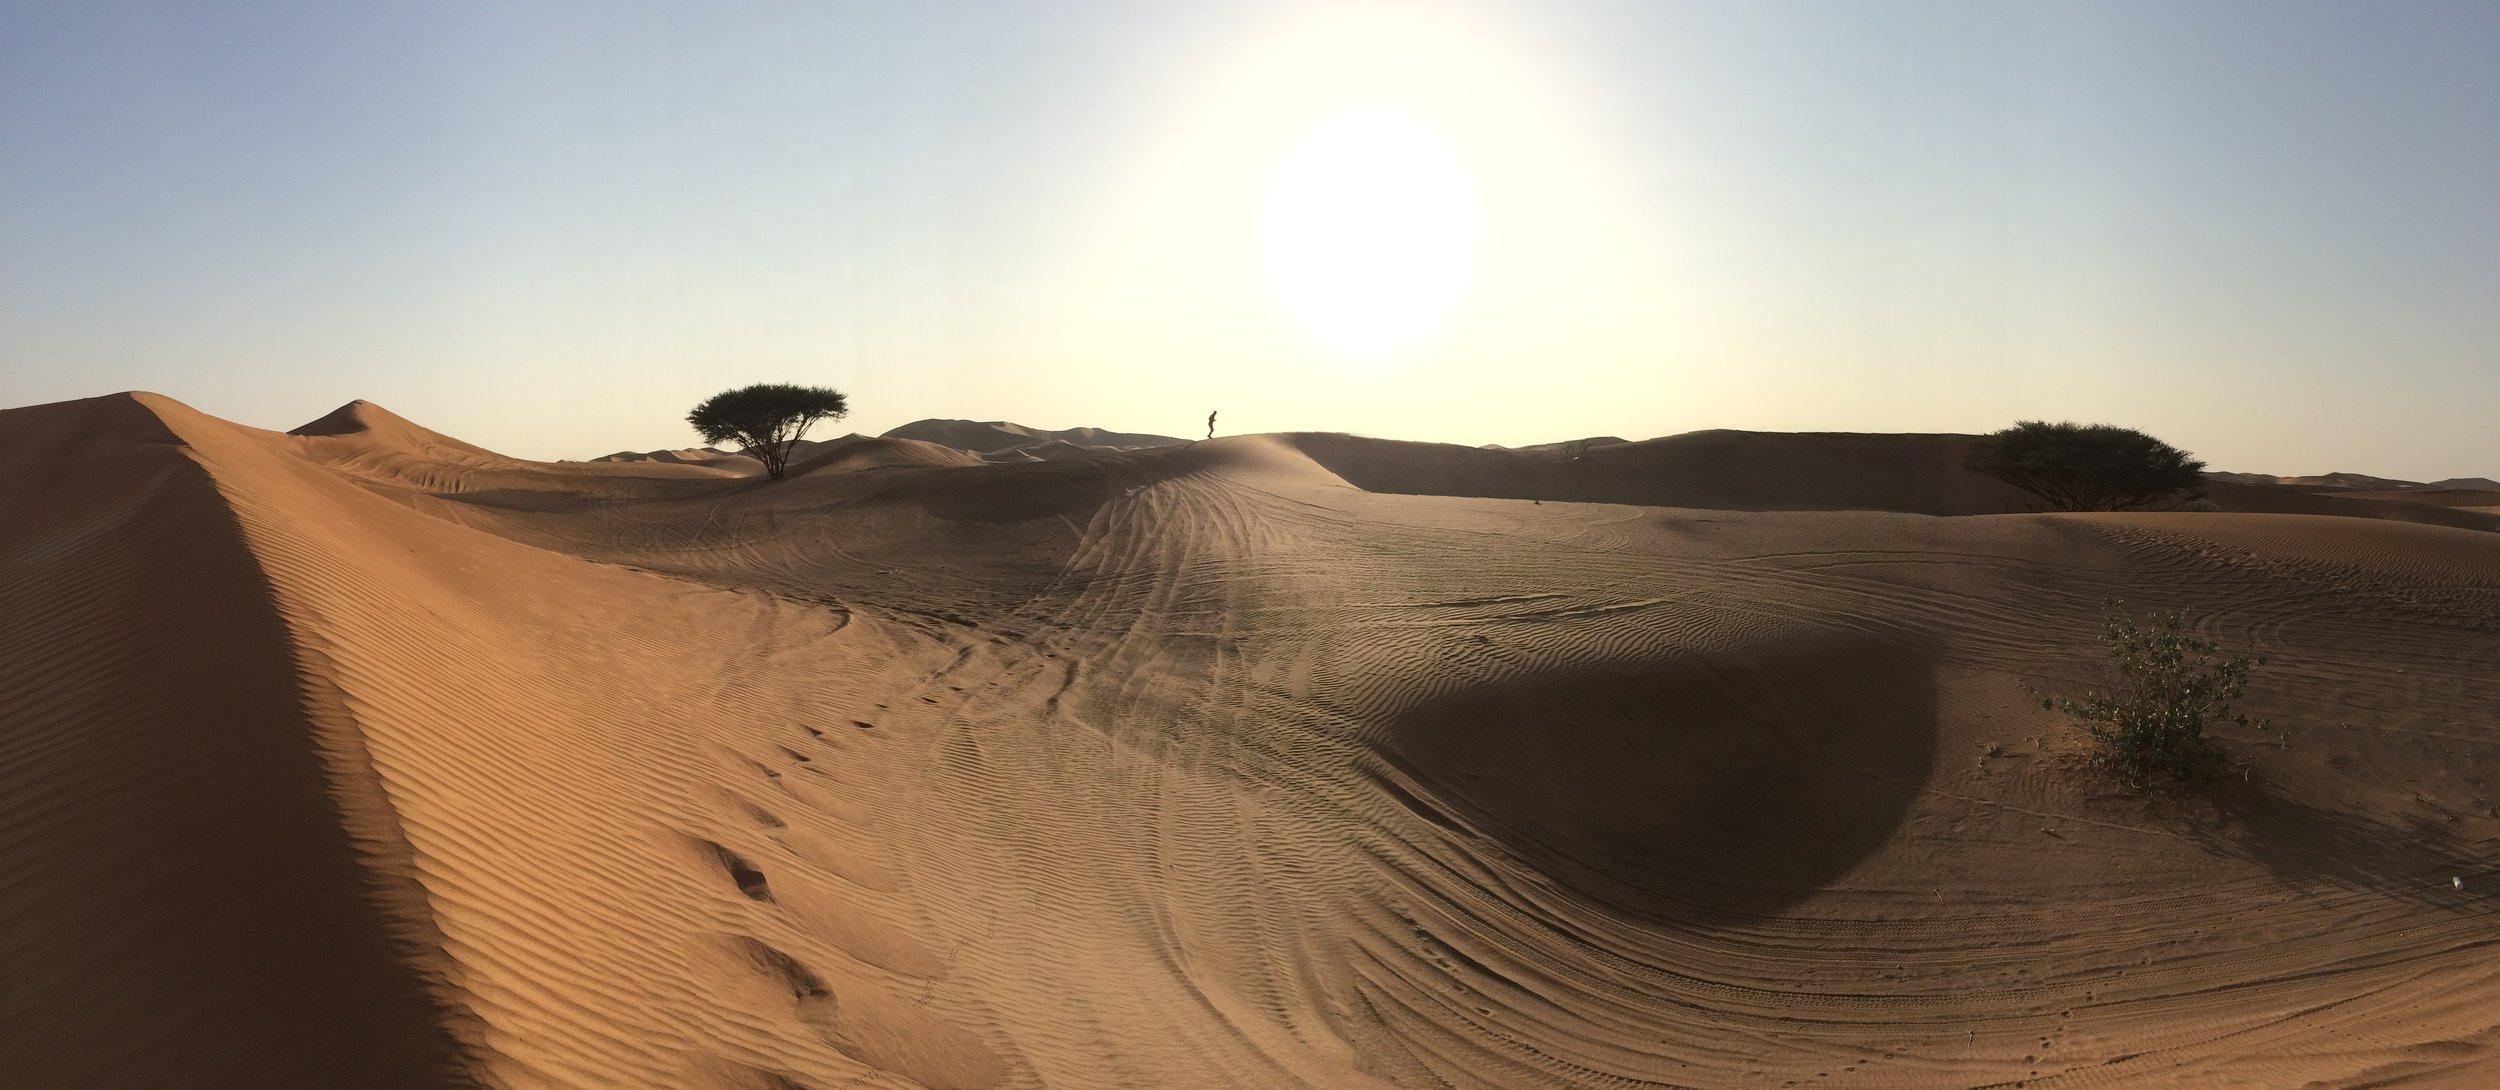 Dubai Dunes - 7.JPG